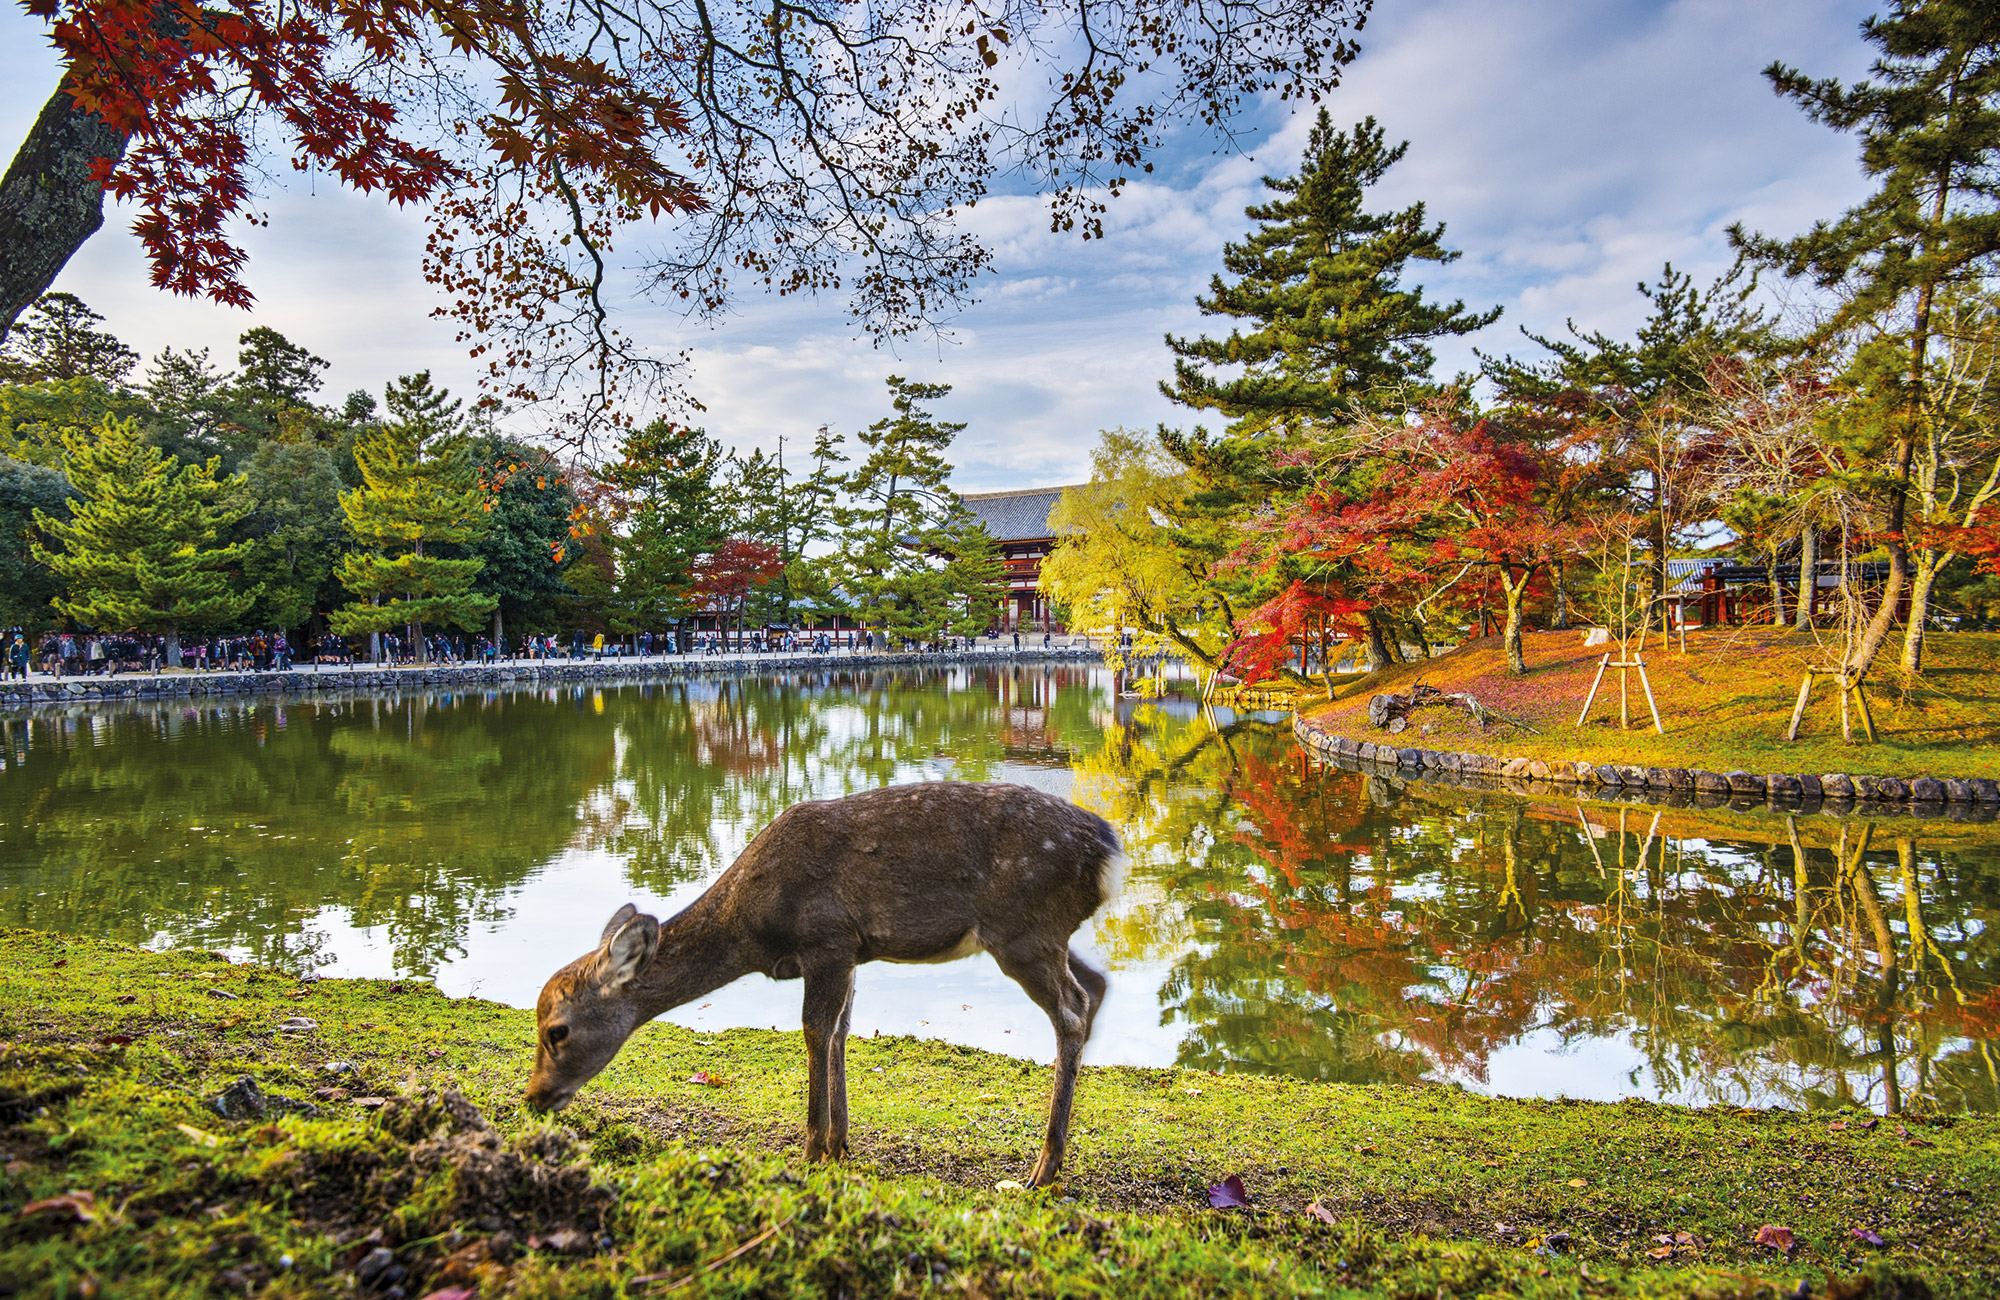 Voyage Japon - Parc de Nara Automne - Amplitudes